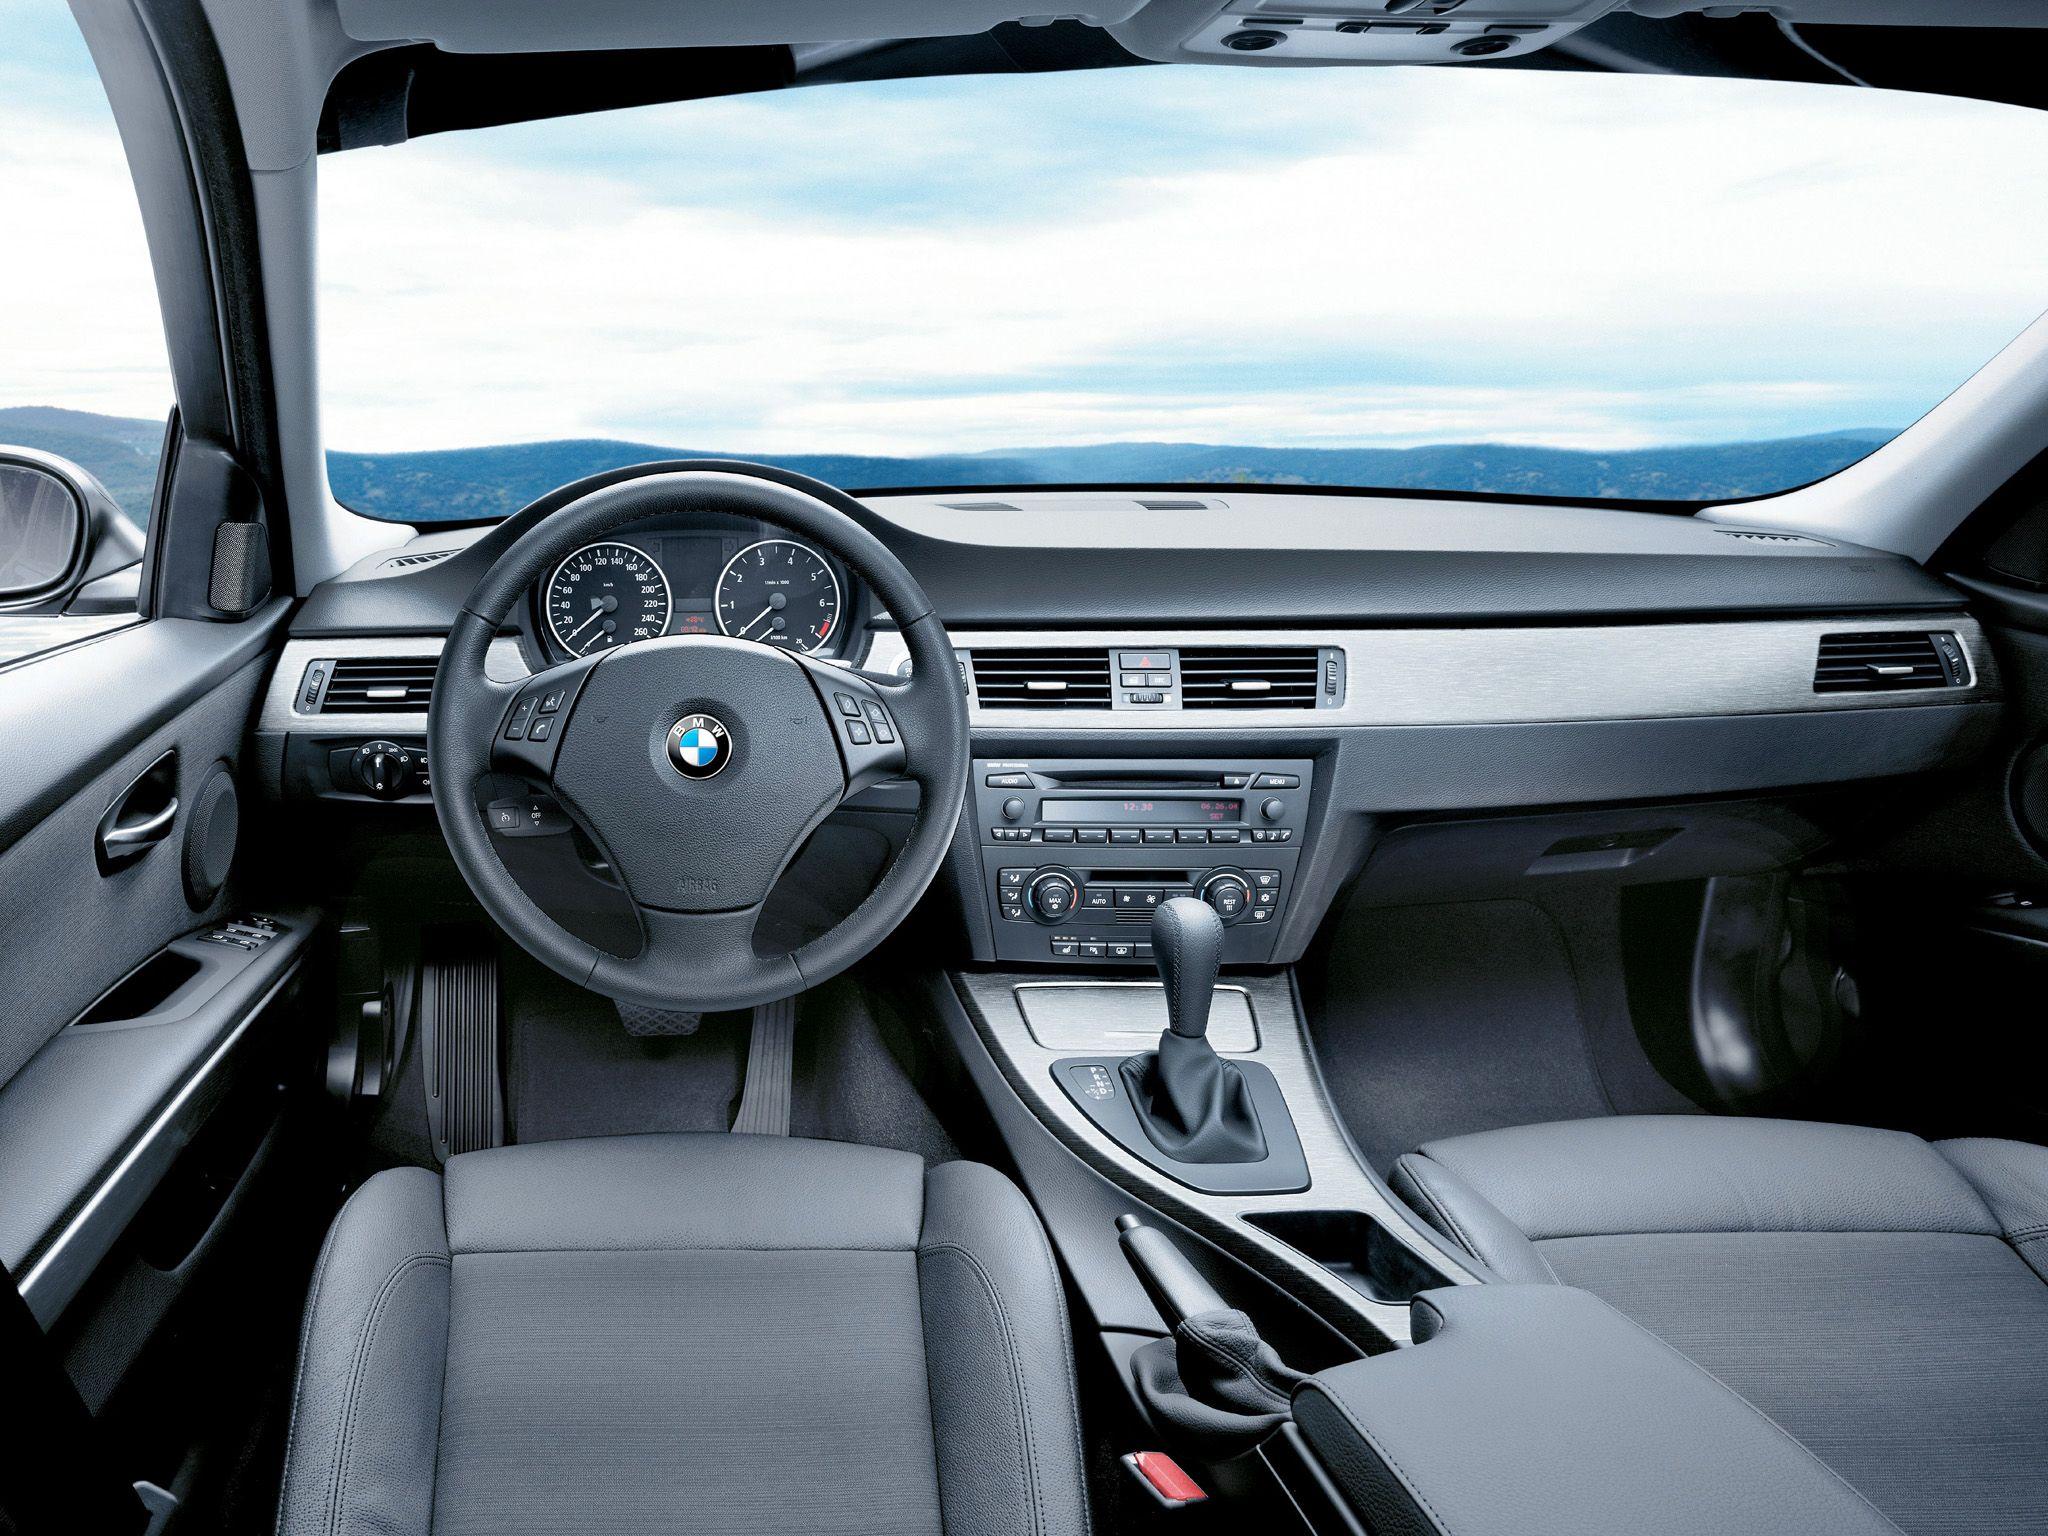 E90 Bmw 330i Dashboard Very Sober Lay Out Bmw Dealership Bmw 3 Series Bmw Alpina